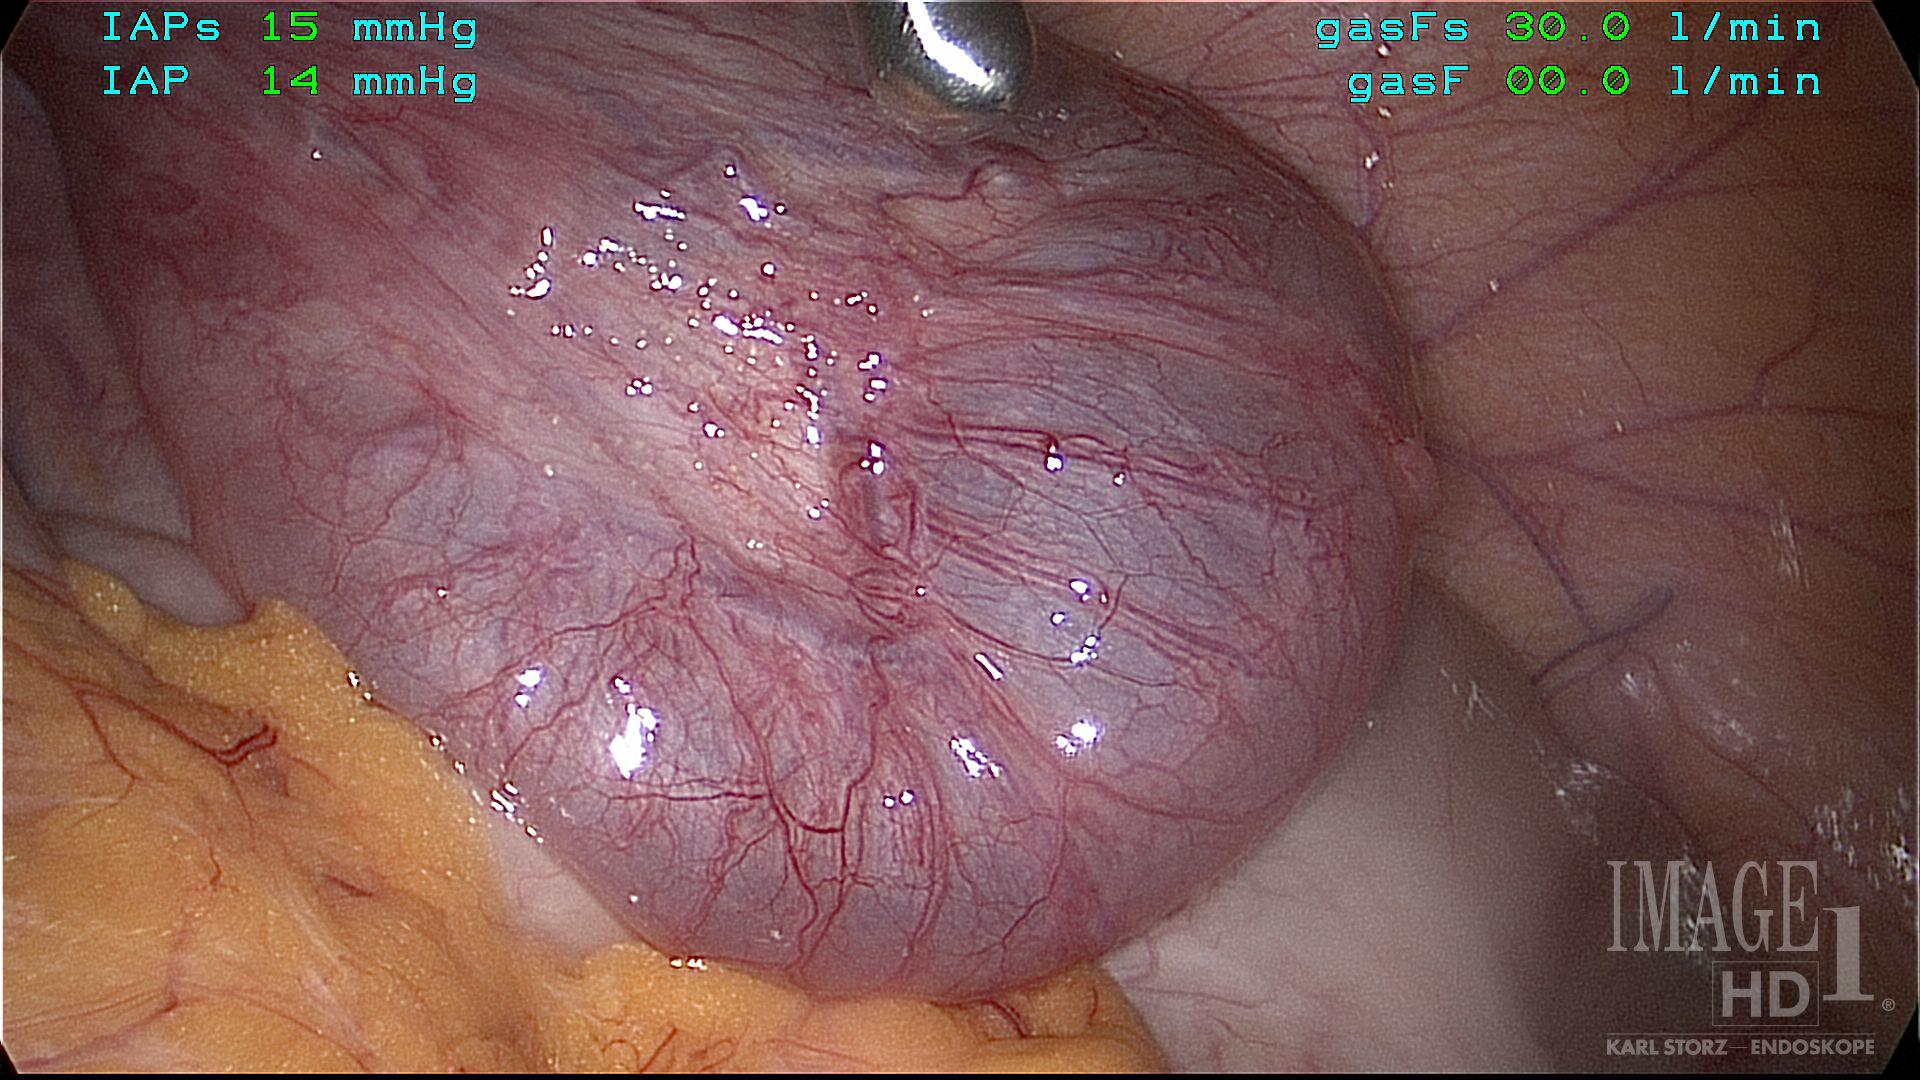 Laparoscopy Right hydrosalpinx